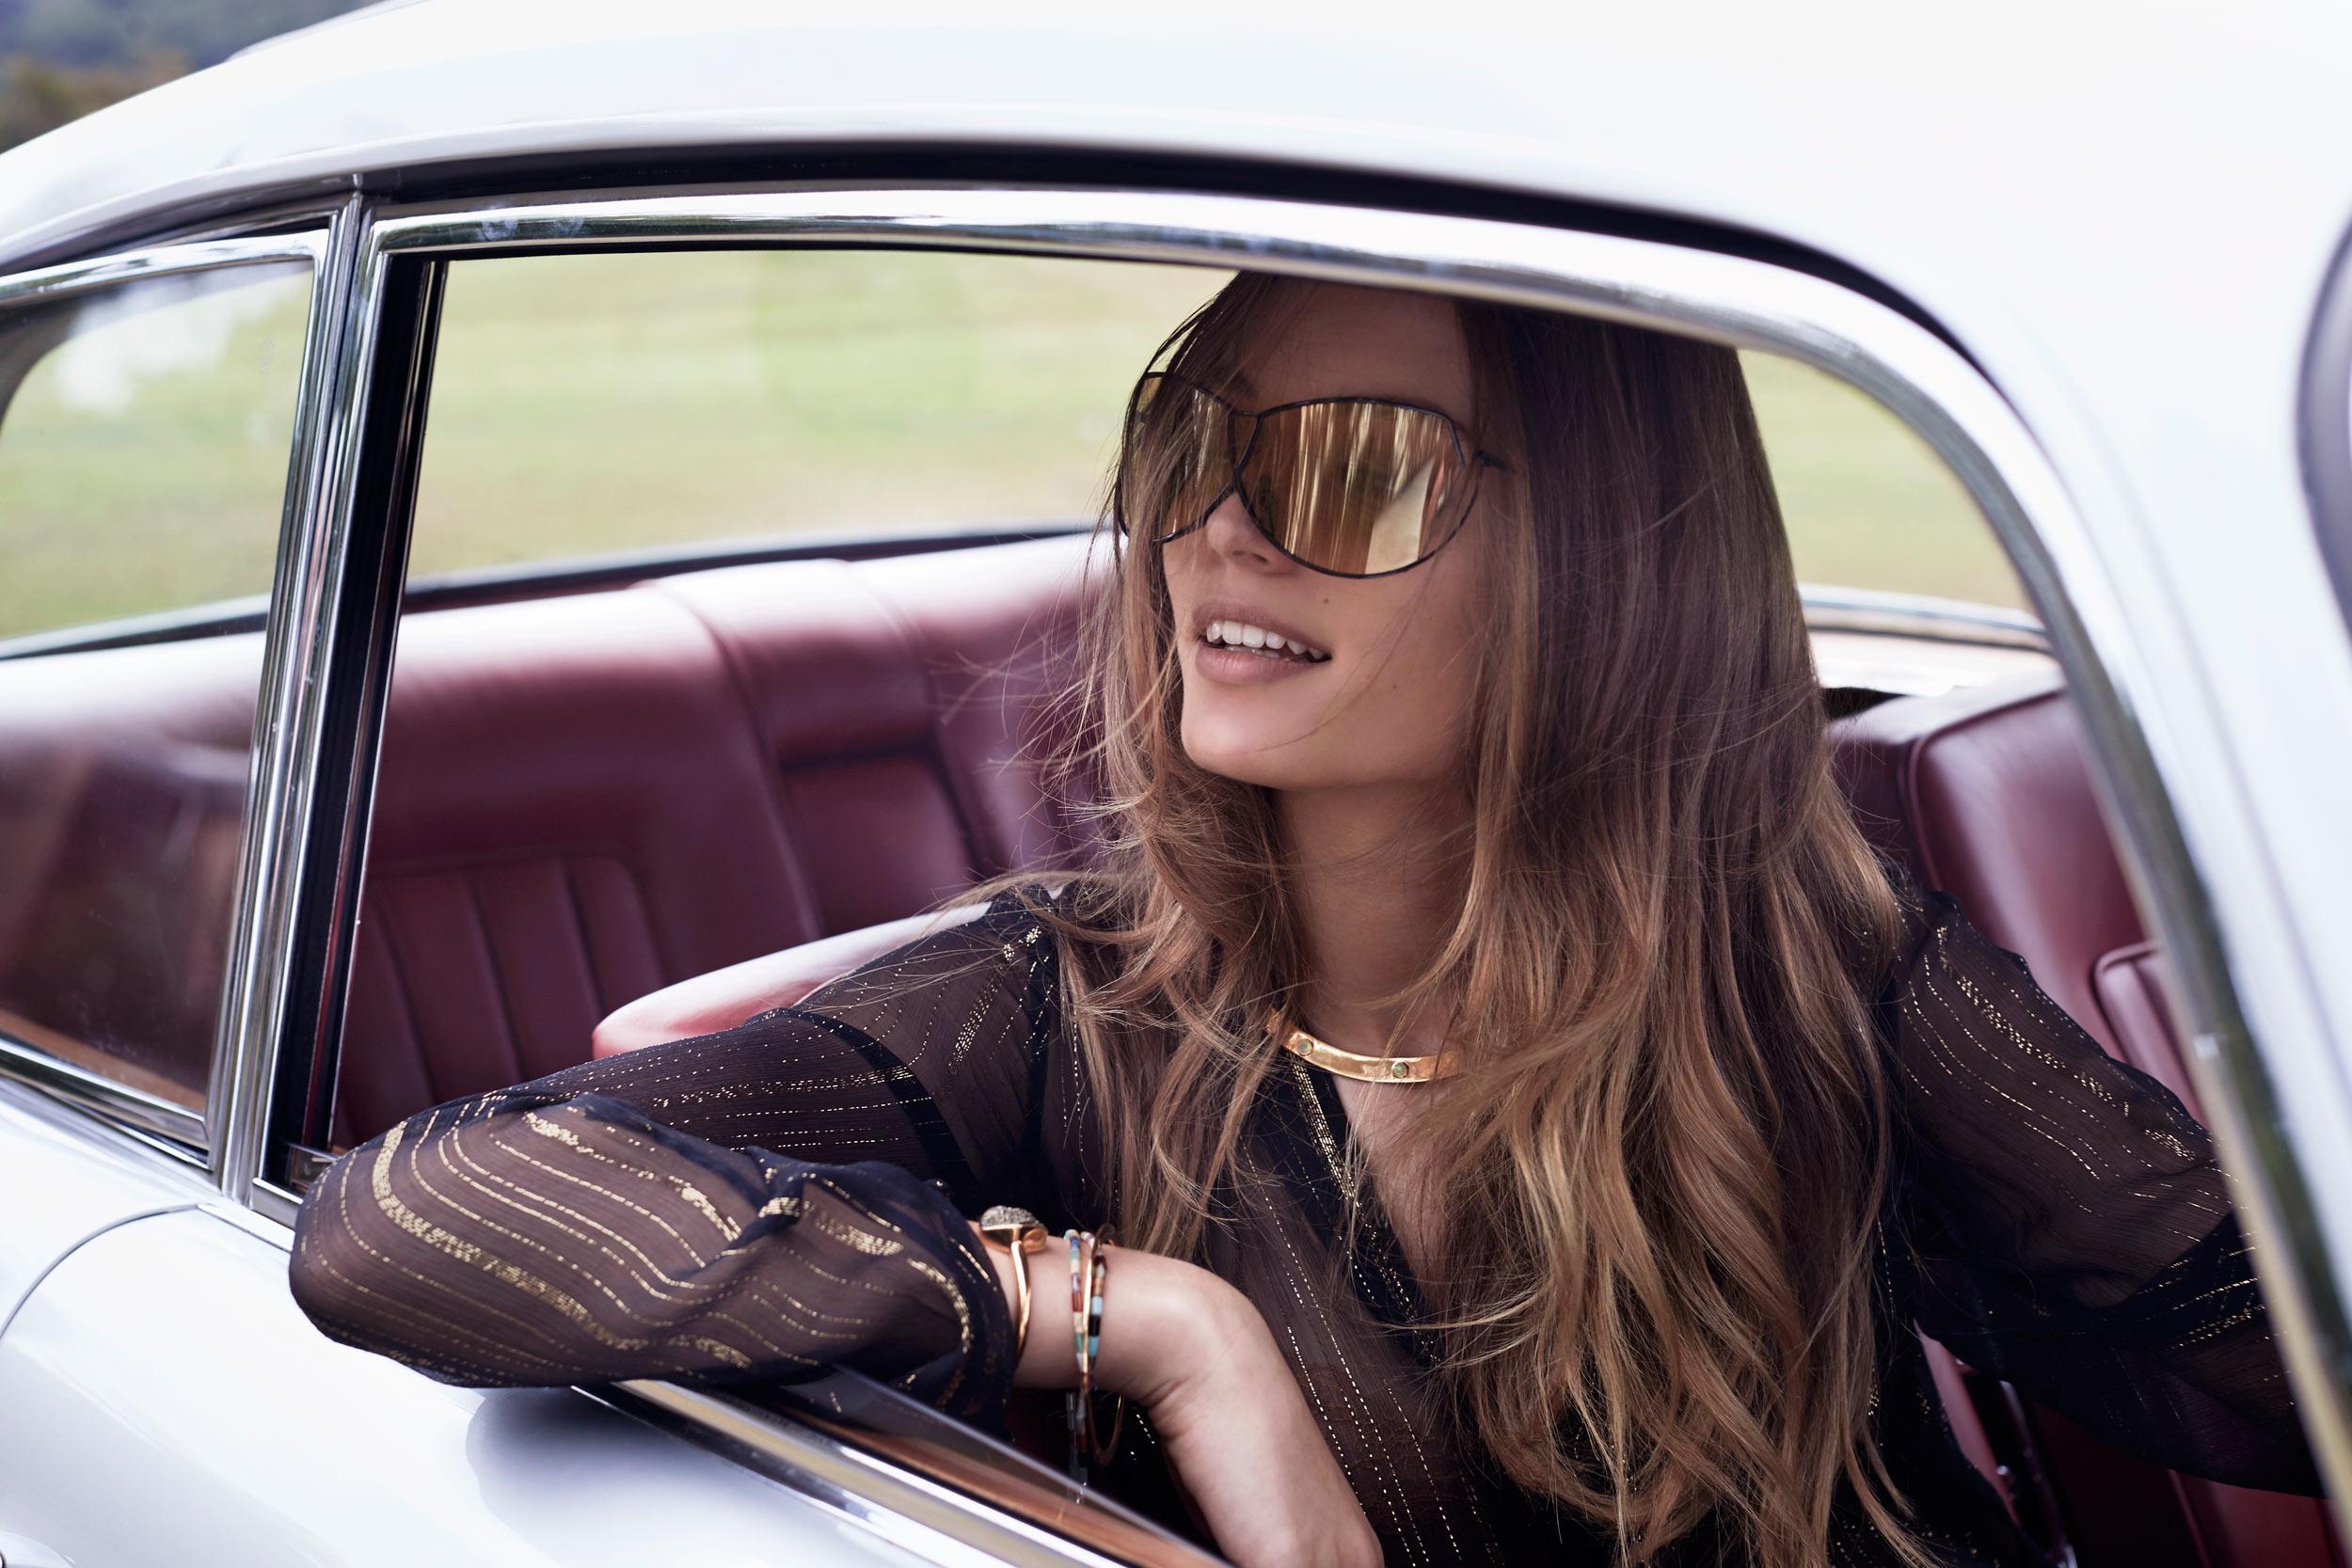 new_160912_Australian_fashion_car_01_121-1.jpg